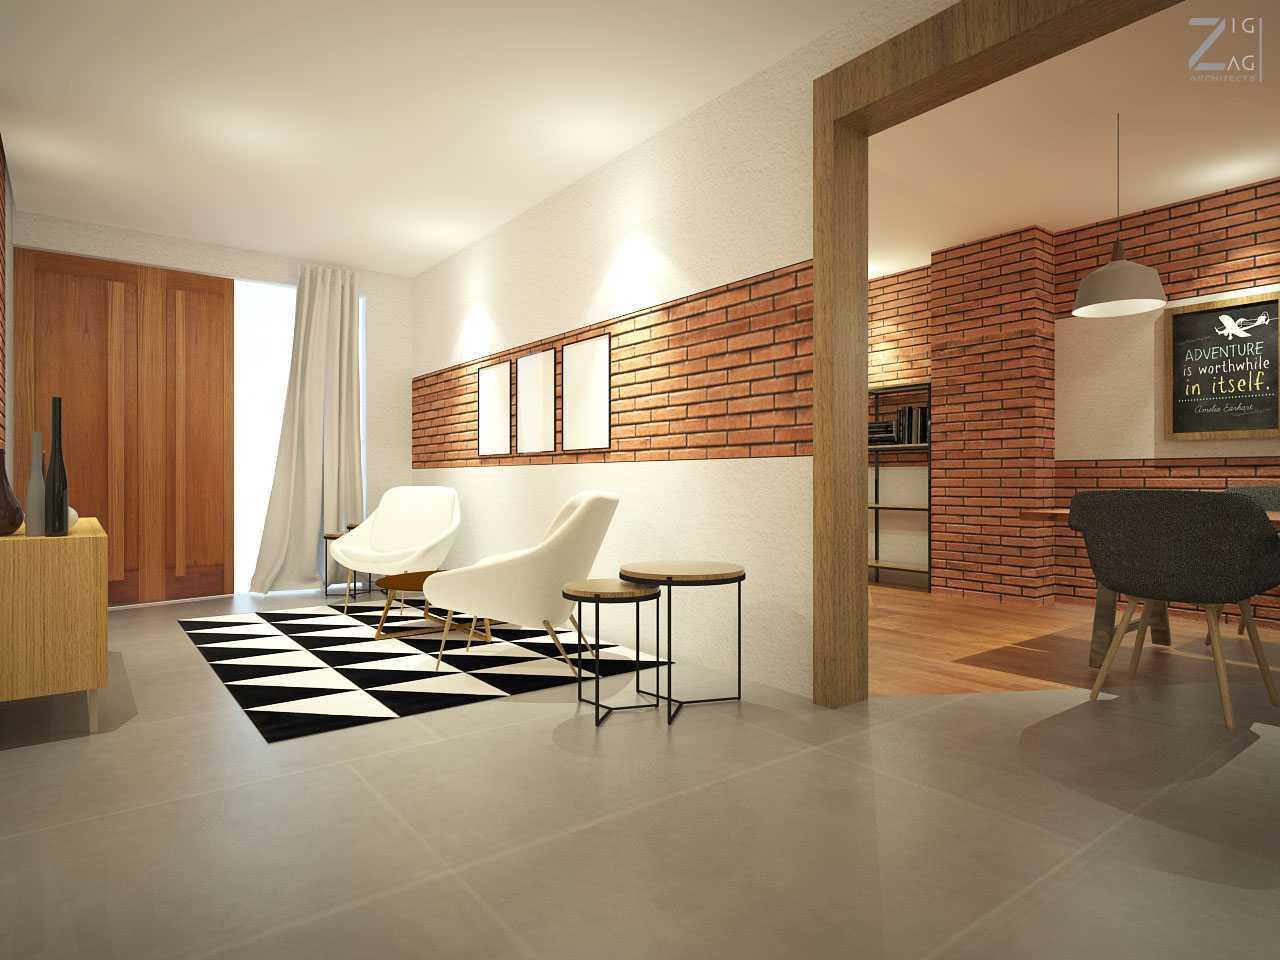 Zigzag Architecture Studio Pulomas House Daerah Khusus Ibukota Jakarta, Indonesia  Guestarea-View02  37605